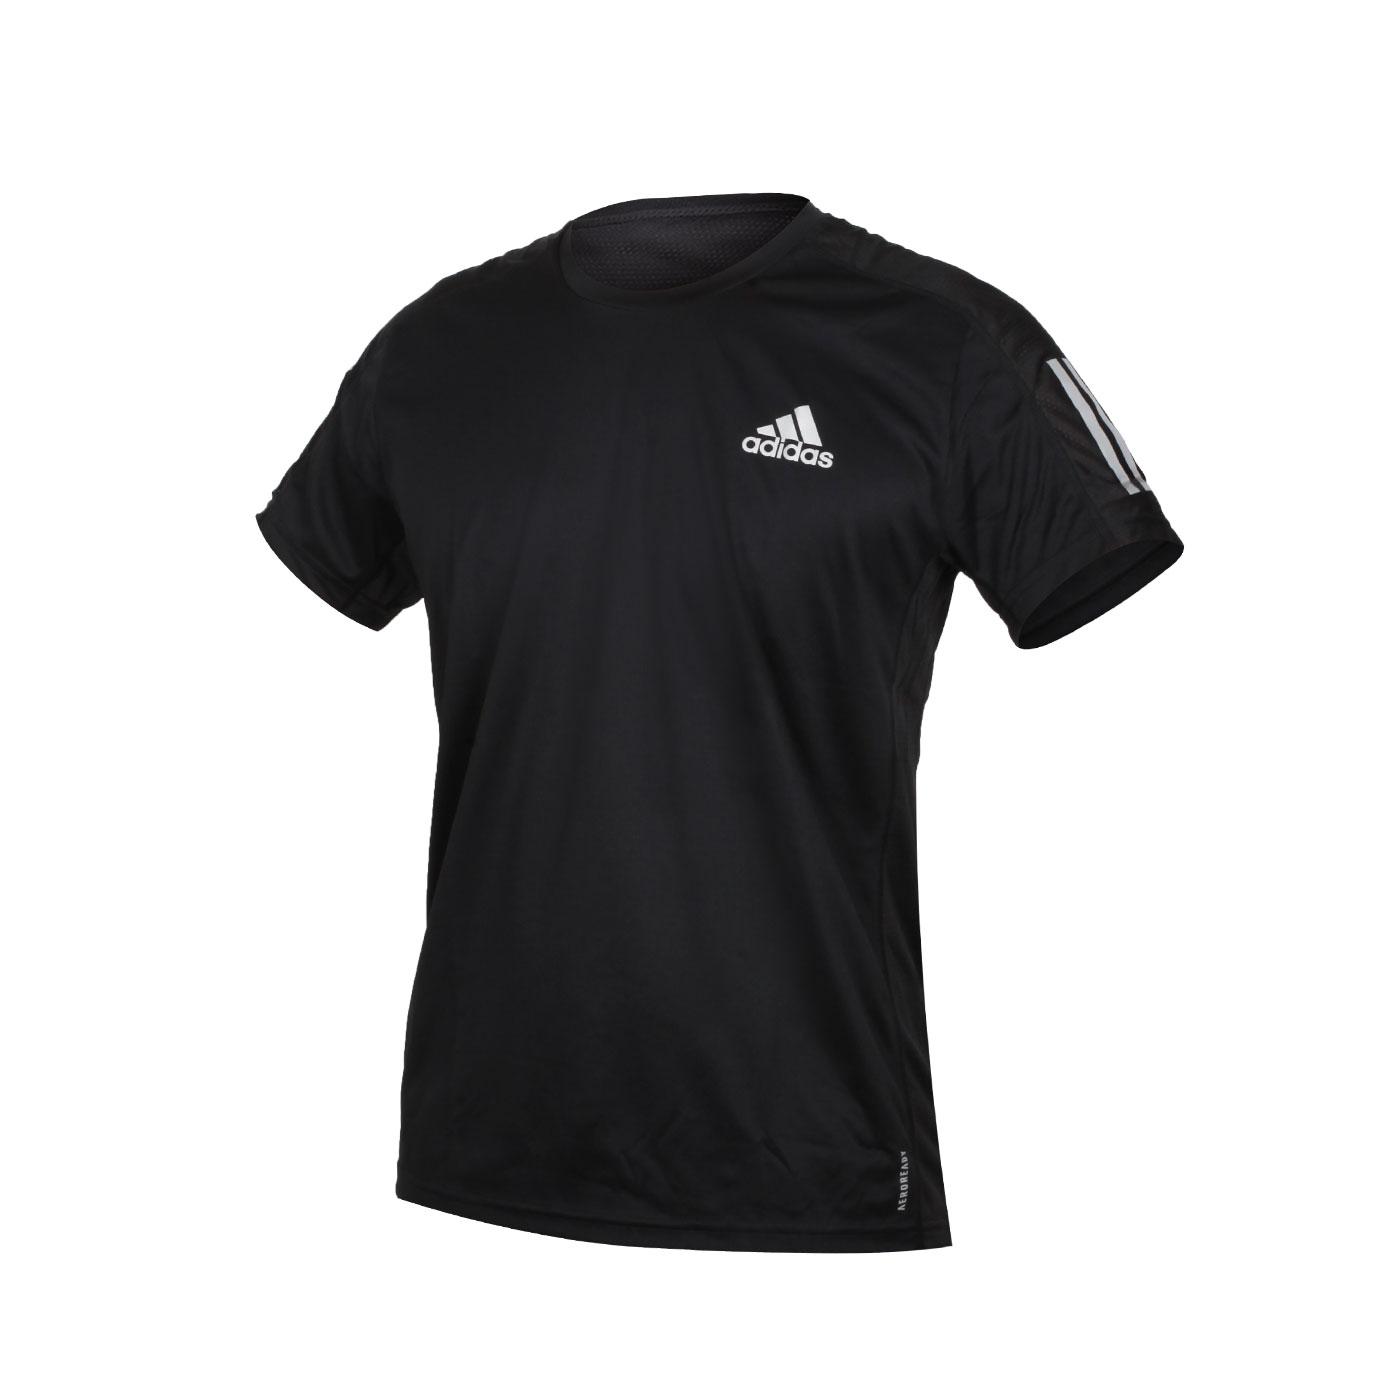 ADIDAS 男款短袖T恤 FS9799